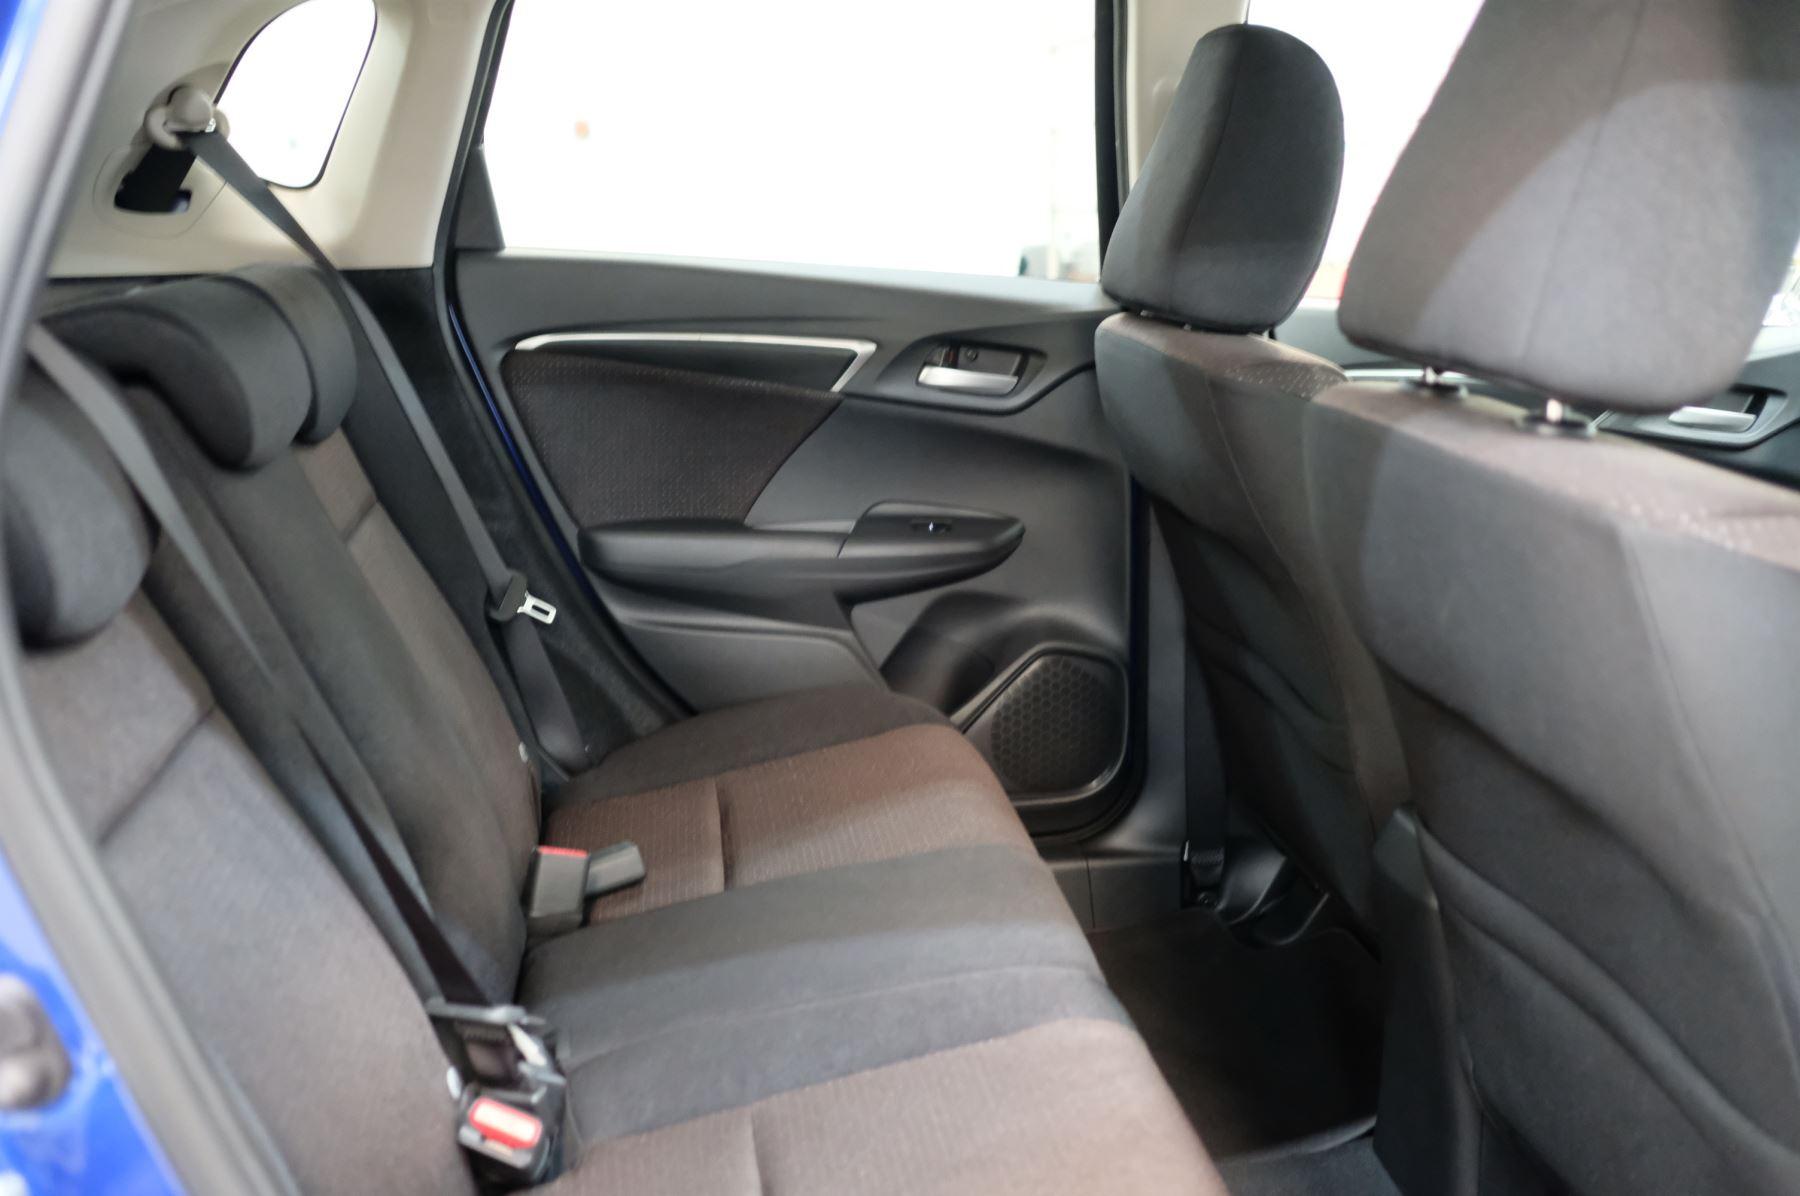 Honda Jazz 1.3 EX 5dr image 11